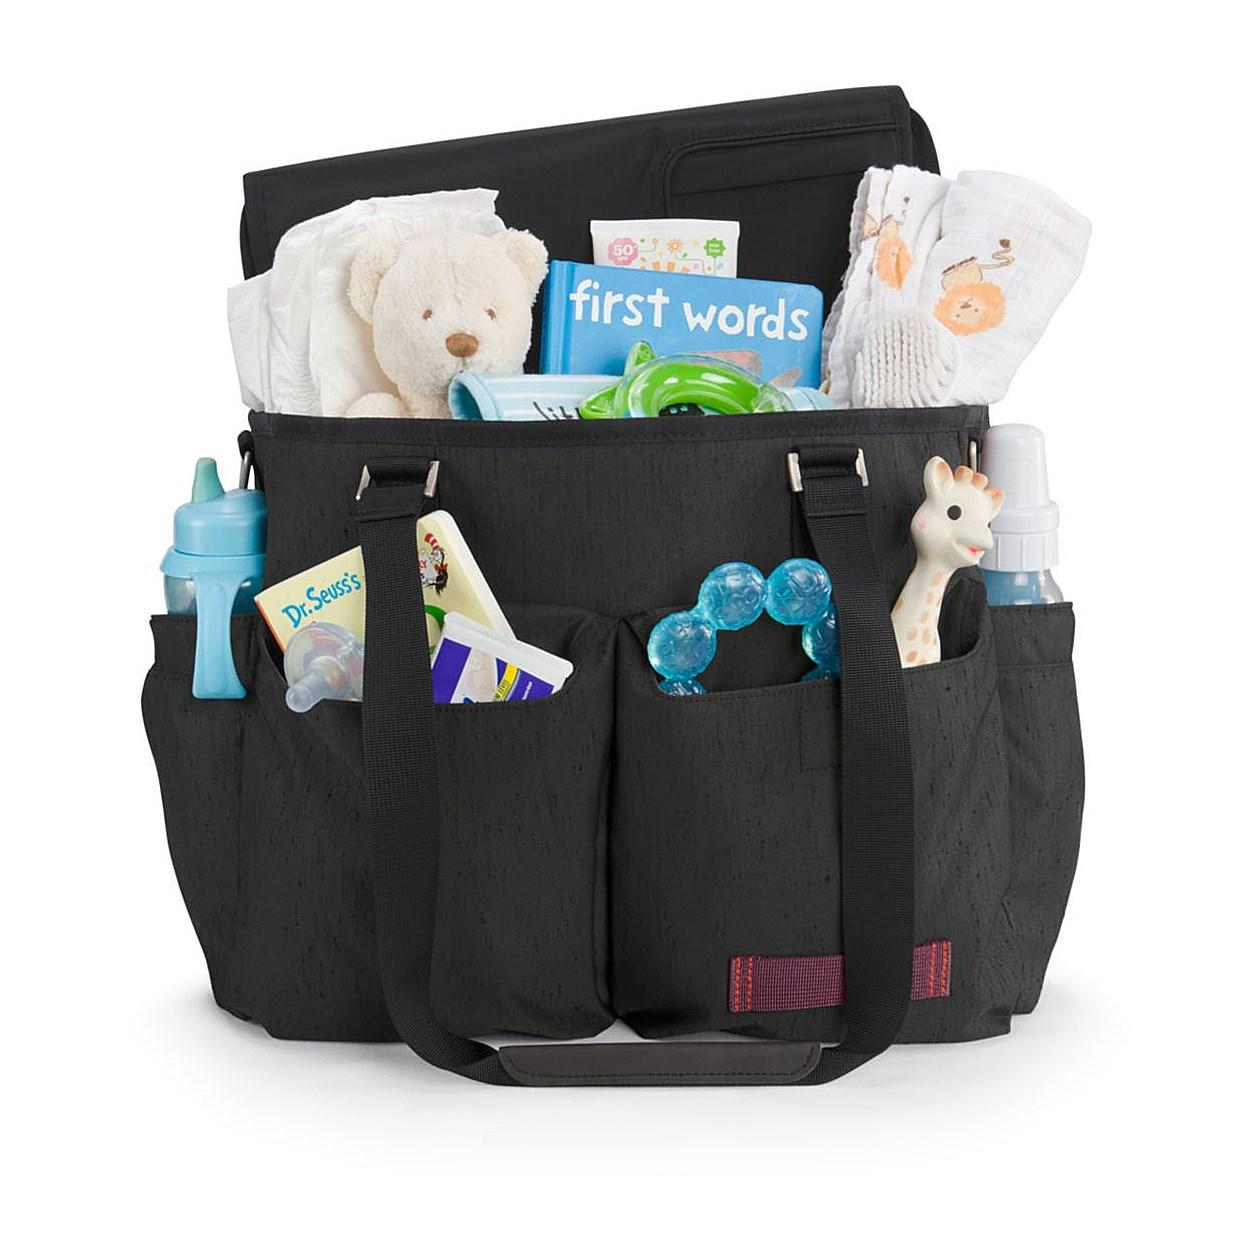 timbuk2 stork tote diaper bag 110mj save 73. Black Bedroom Furniture Sets. Home Design Ideas